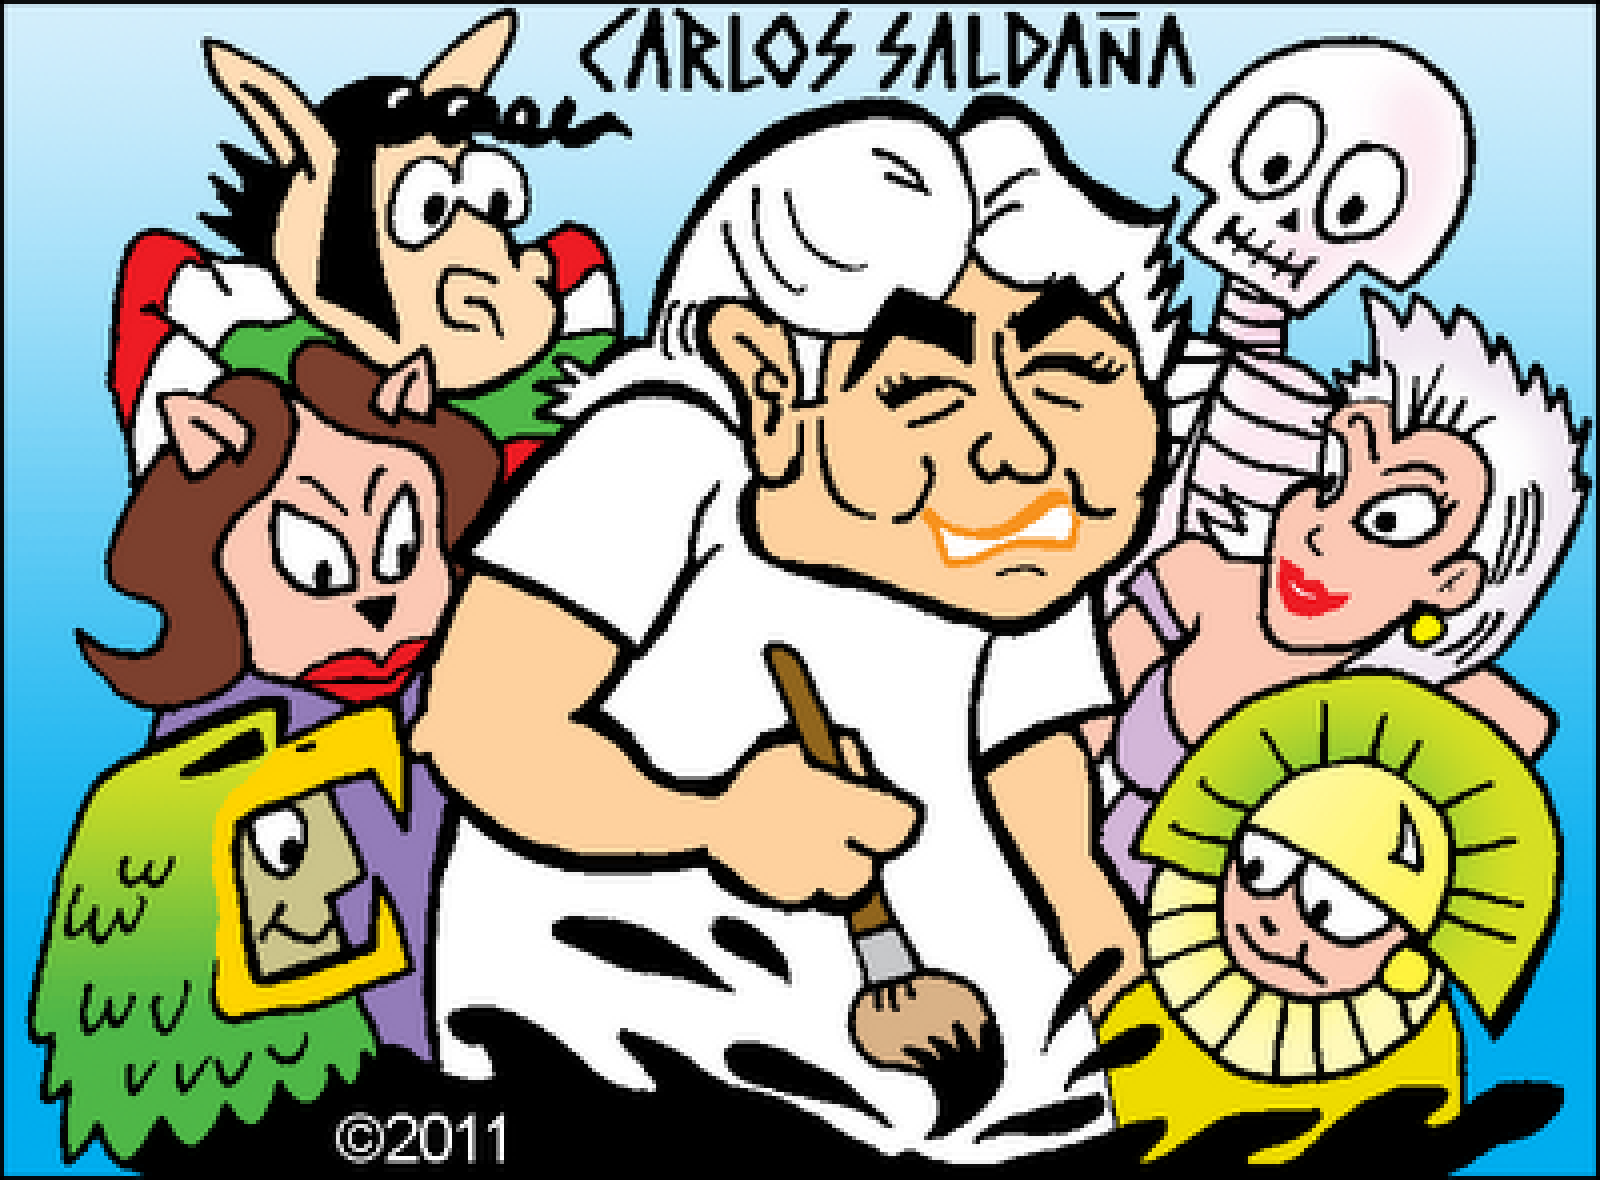 Latino Comics Unite for First-Ever Expo